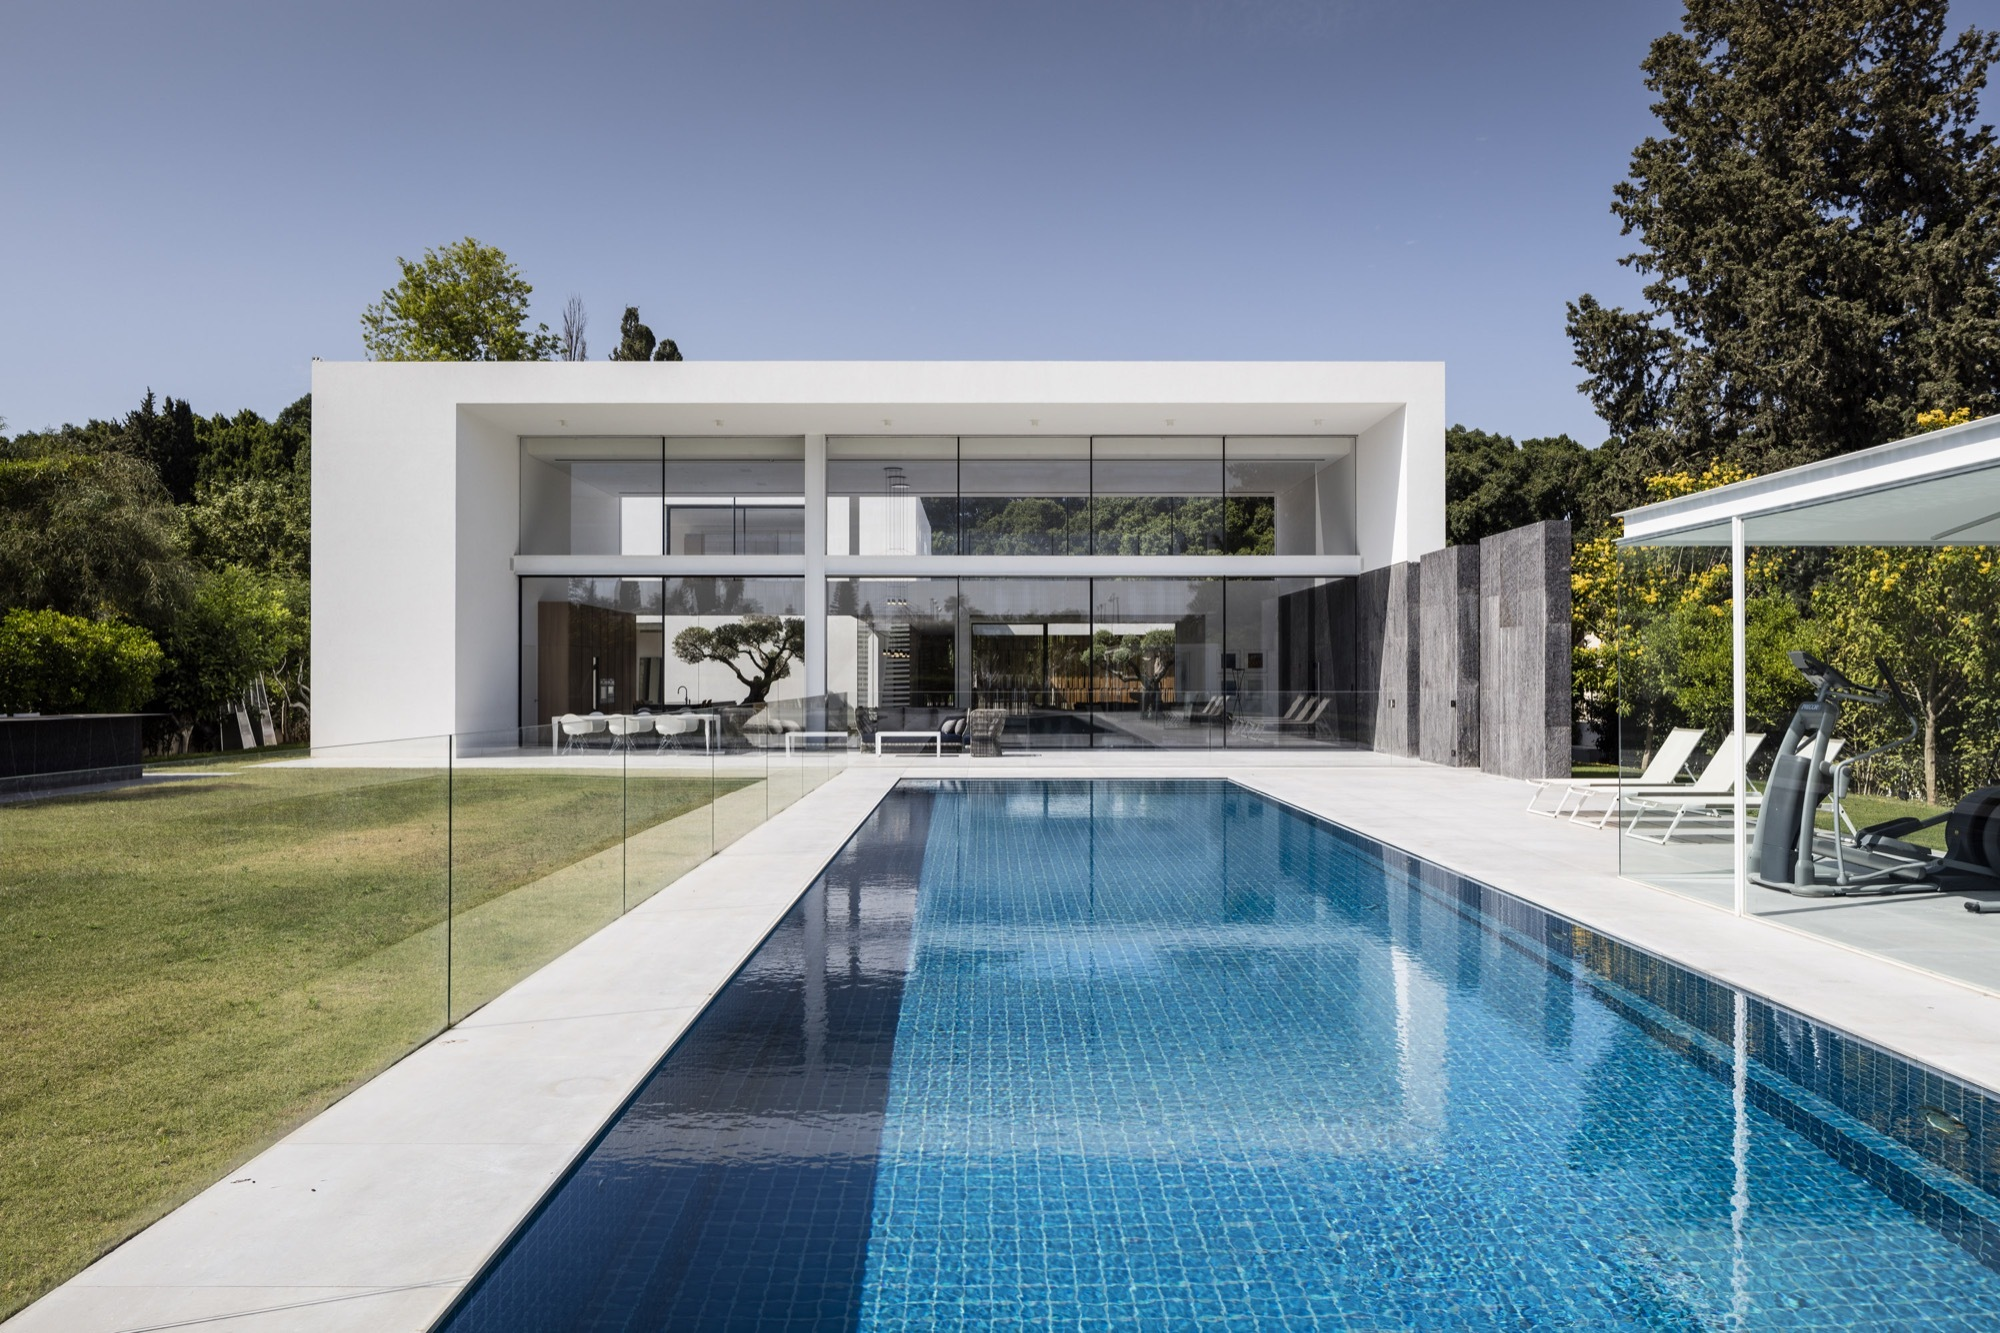 F house pitsou kedem architects archdaily for Casas minimalistas modernas